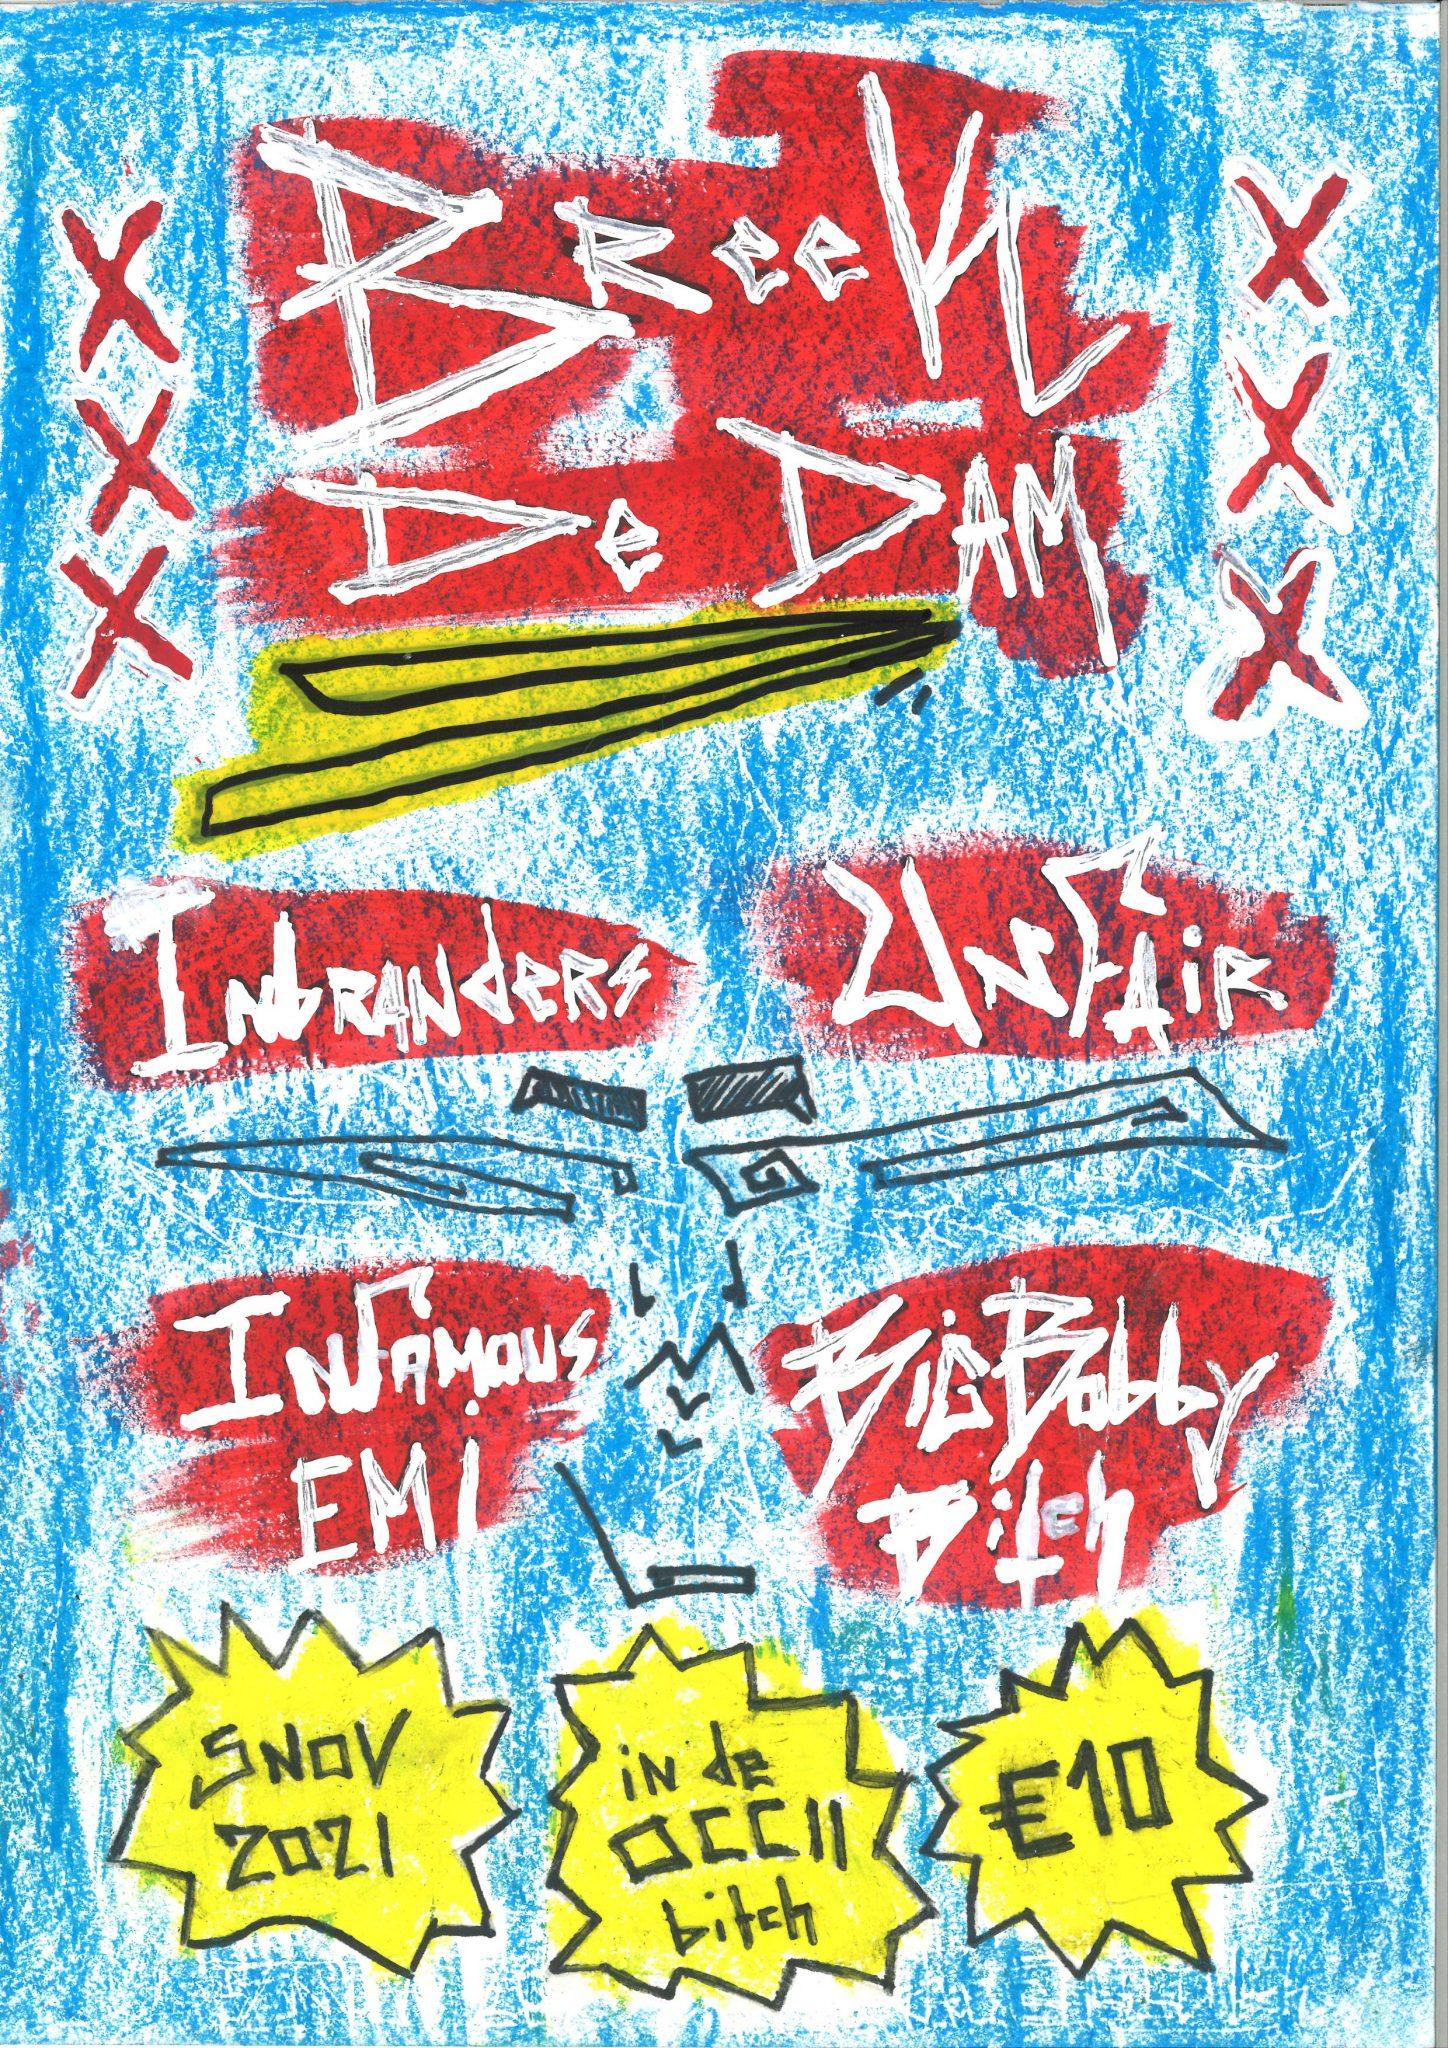 INBRANDERS + INFAMOUS EMI + BIGBOBBYSHYT + UNFAIR